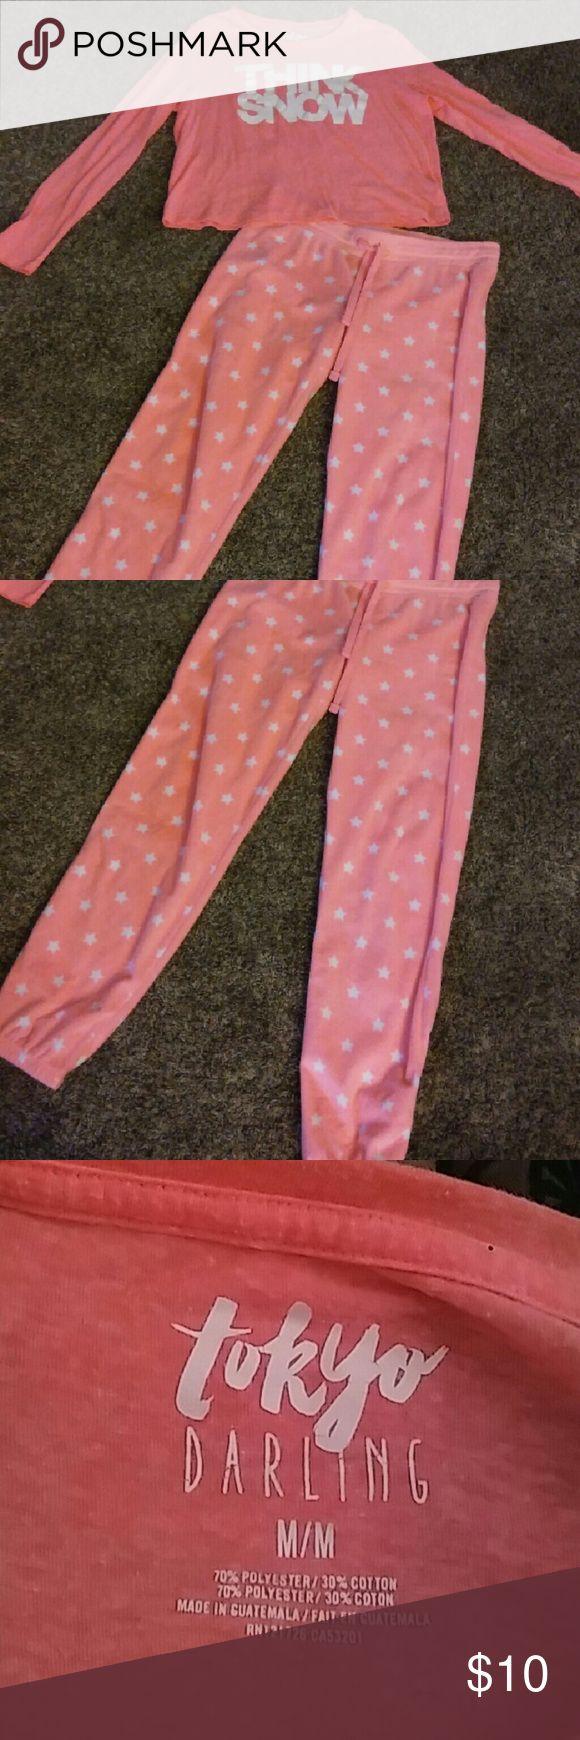 Tokyo Darling pj set Super cute warm and soft! Intimates & Sleepwear Pajamas